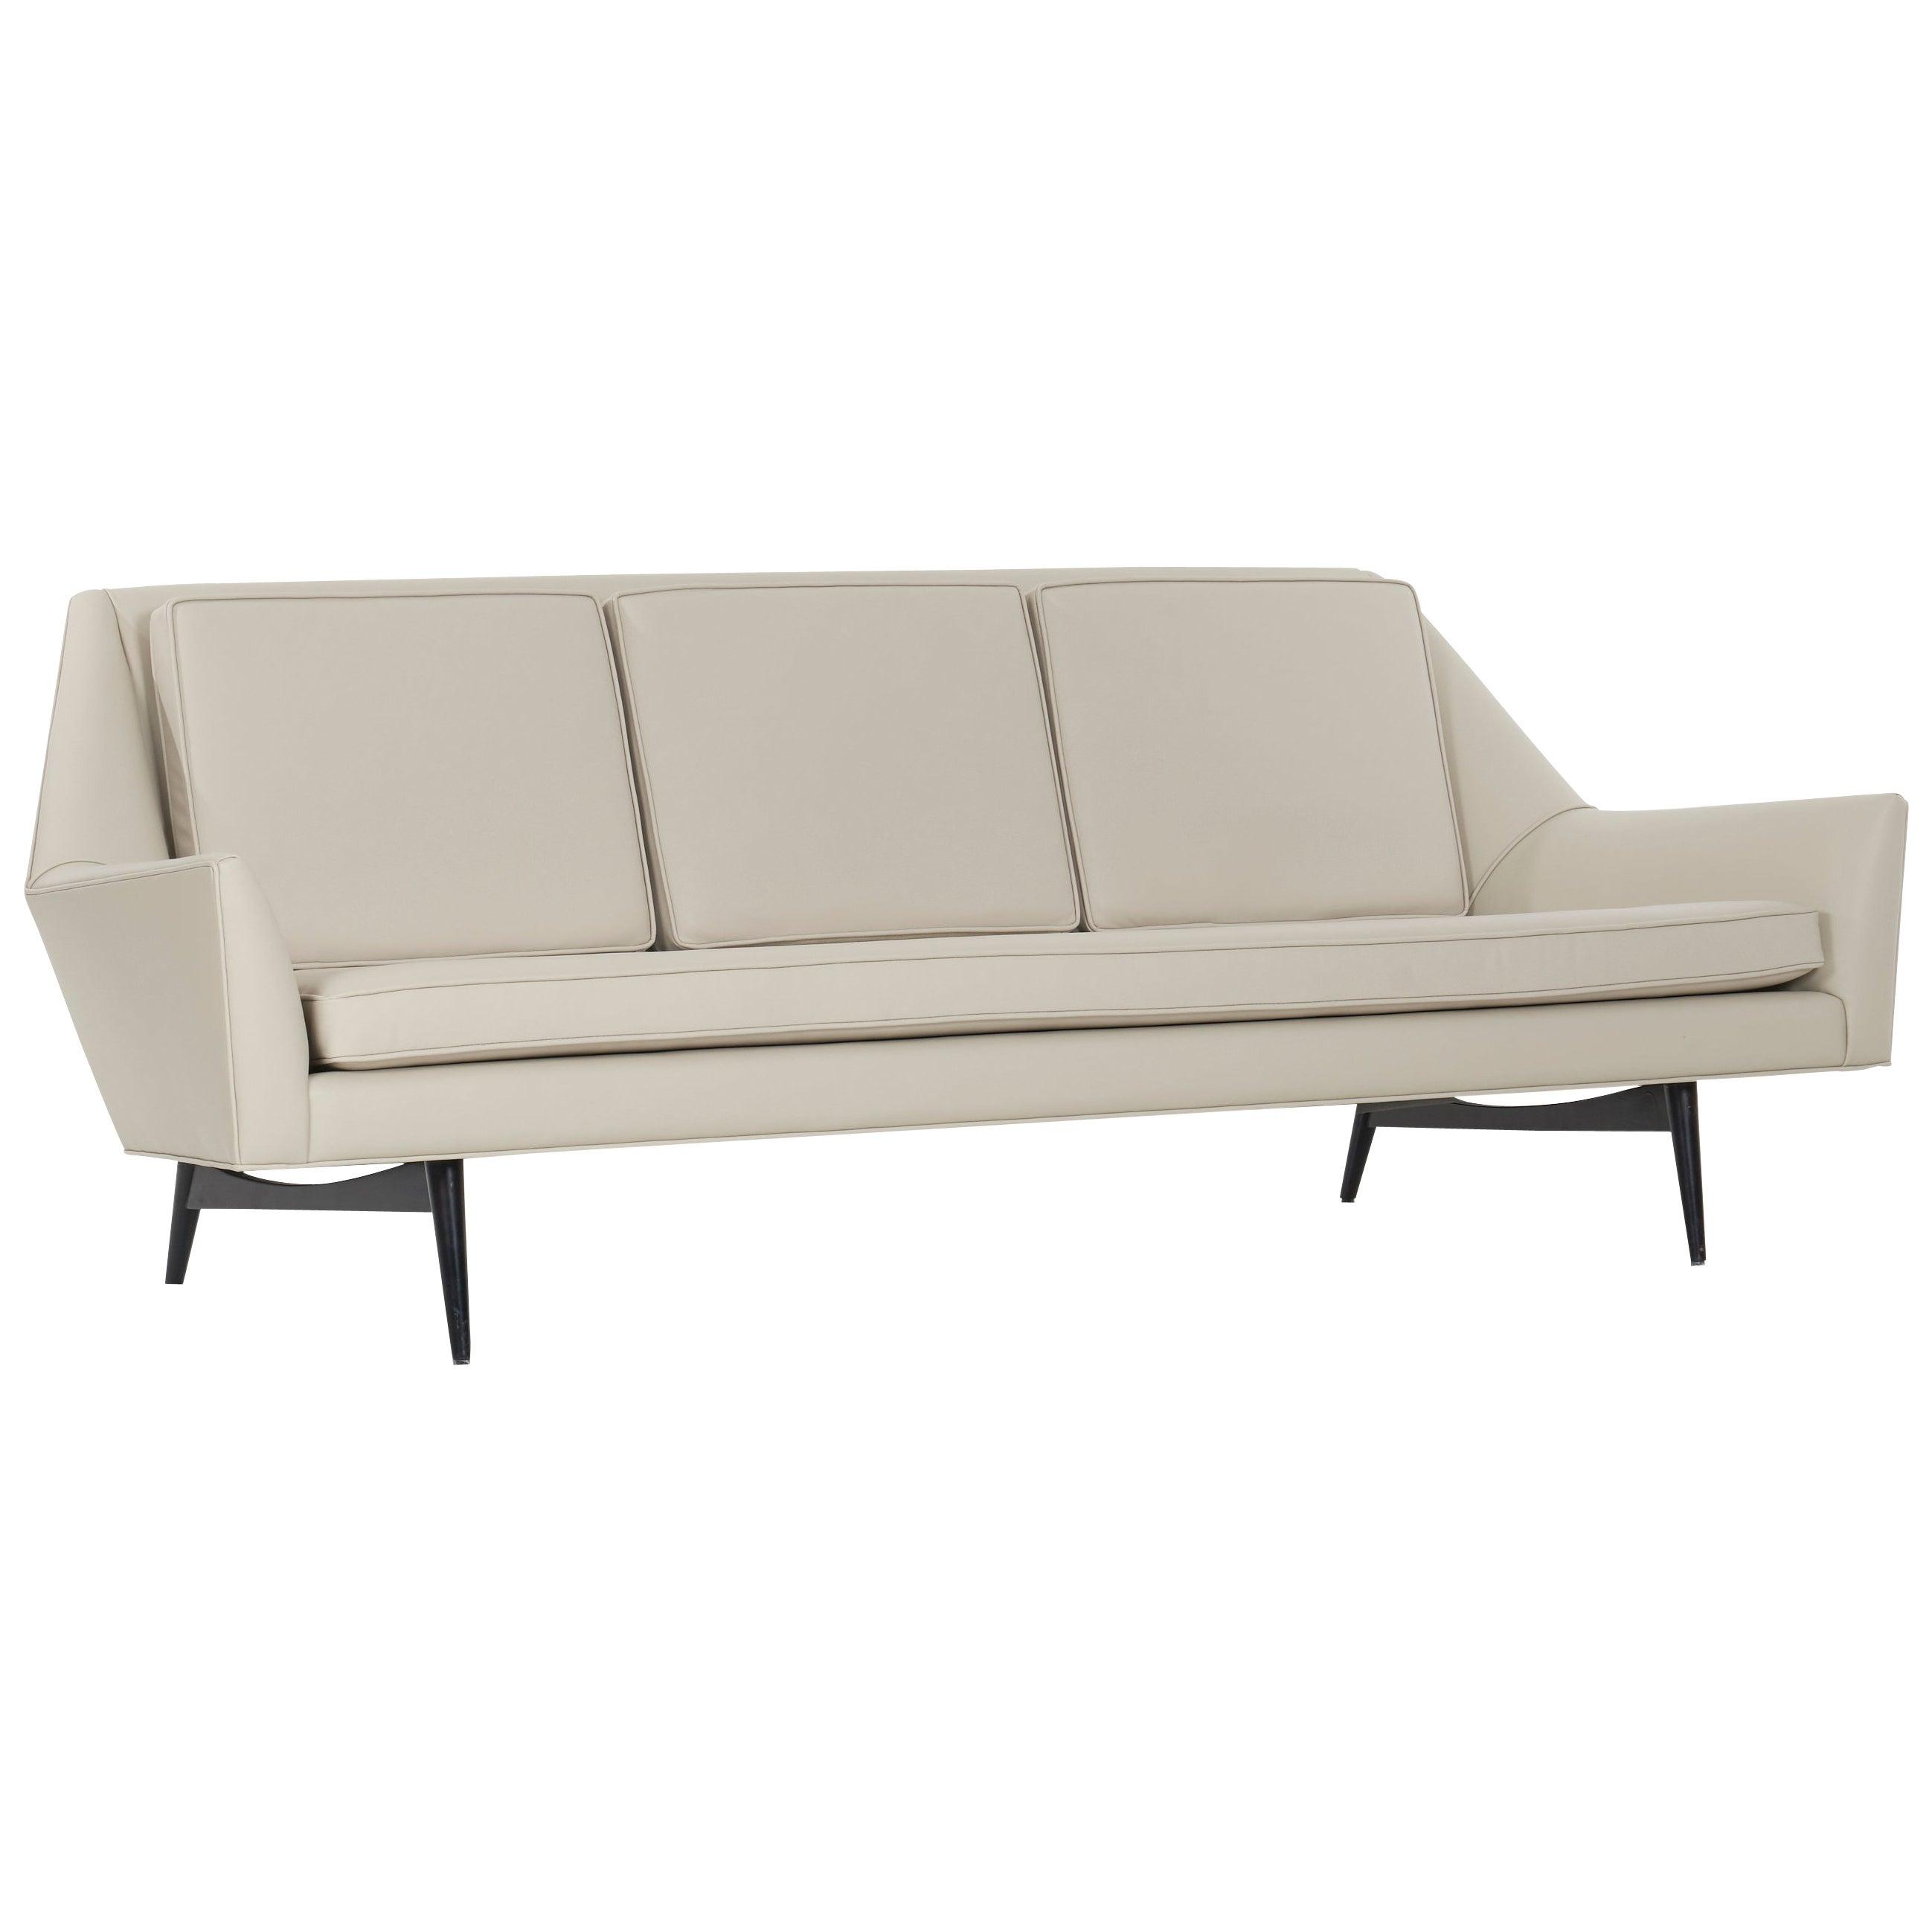 Paul McCobb Origami Sofa